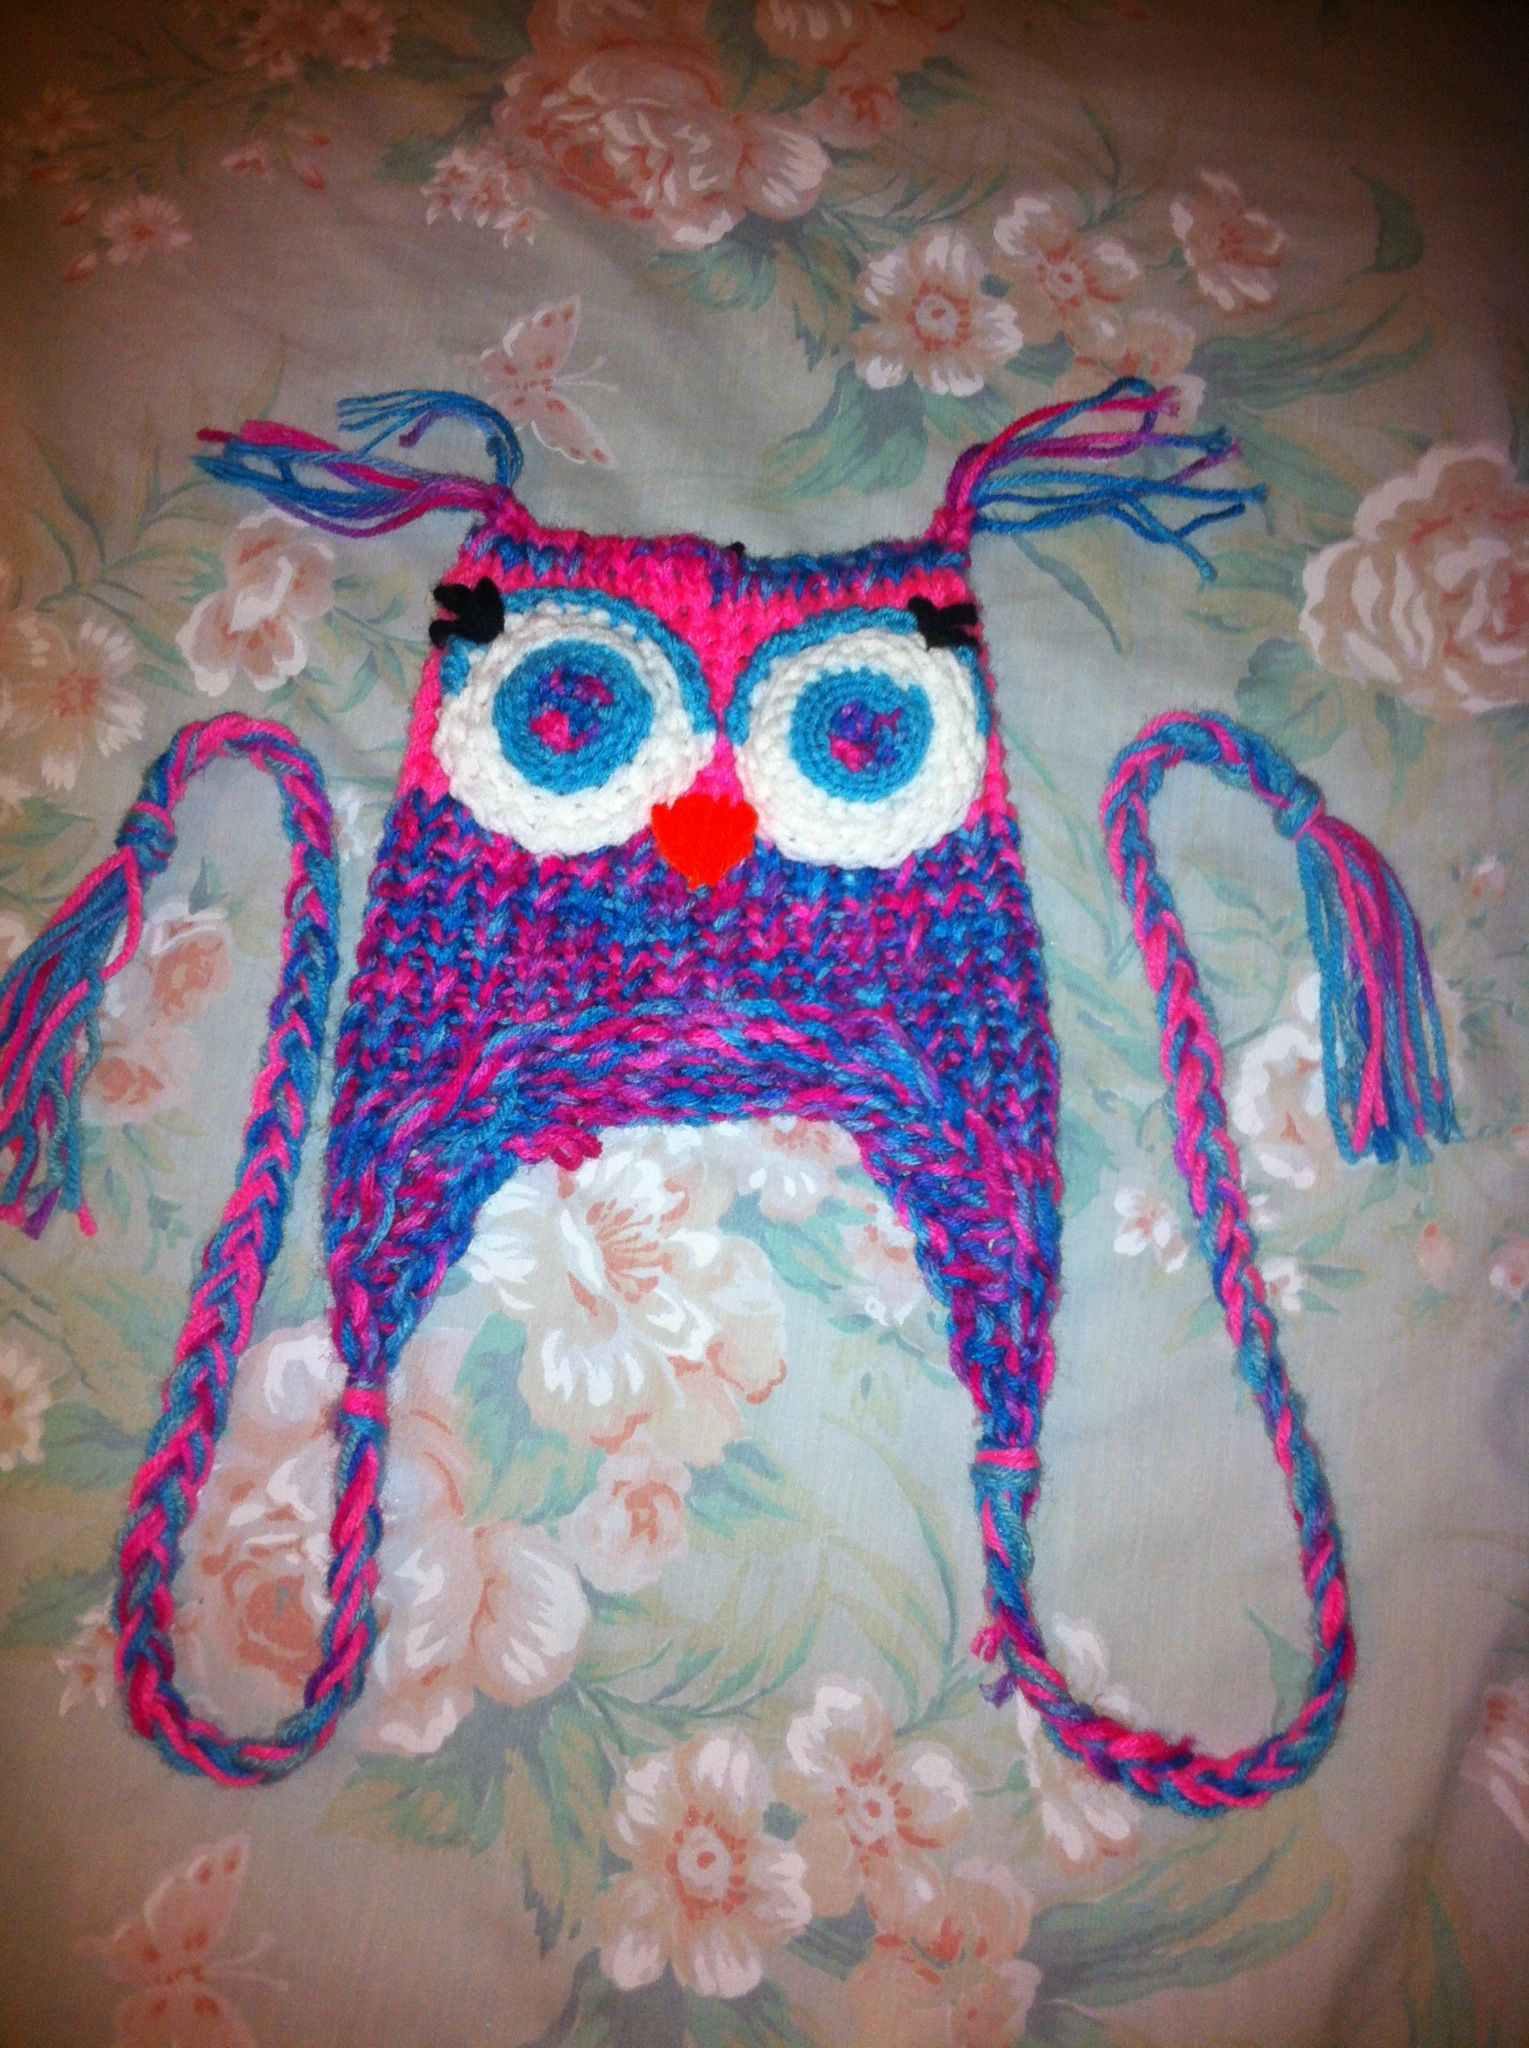 Loom Knit Owl Hat Loom Knitting Pinterest Knitted Owl Loom